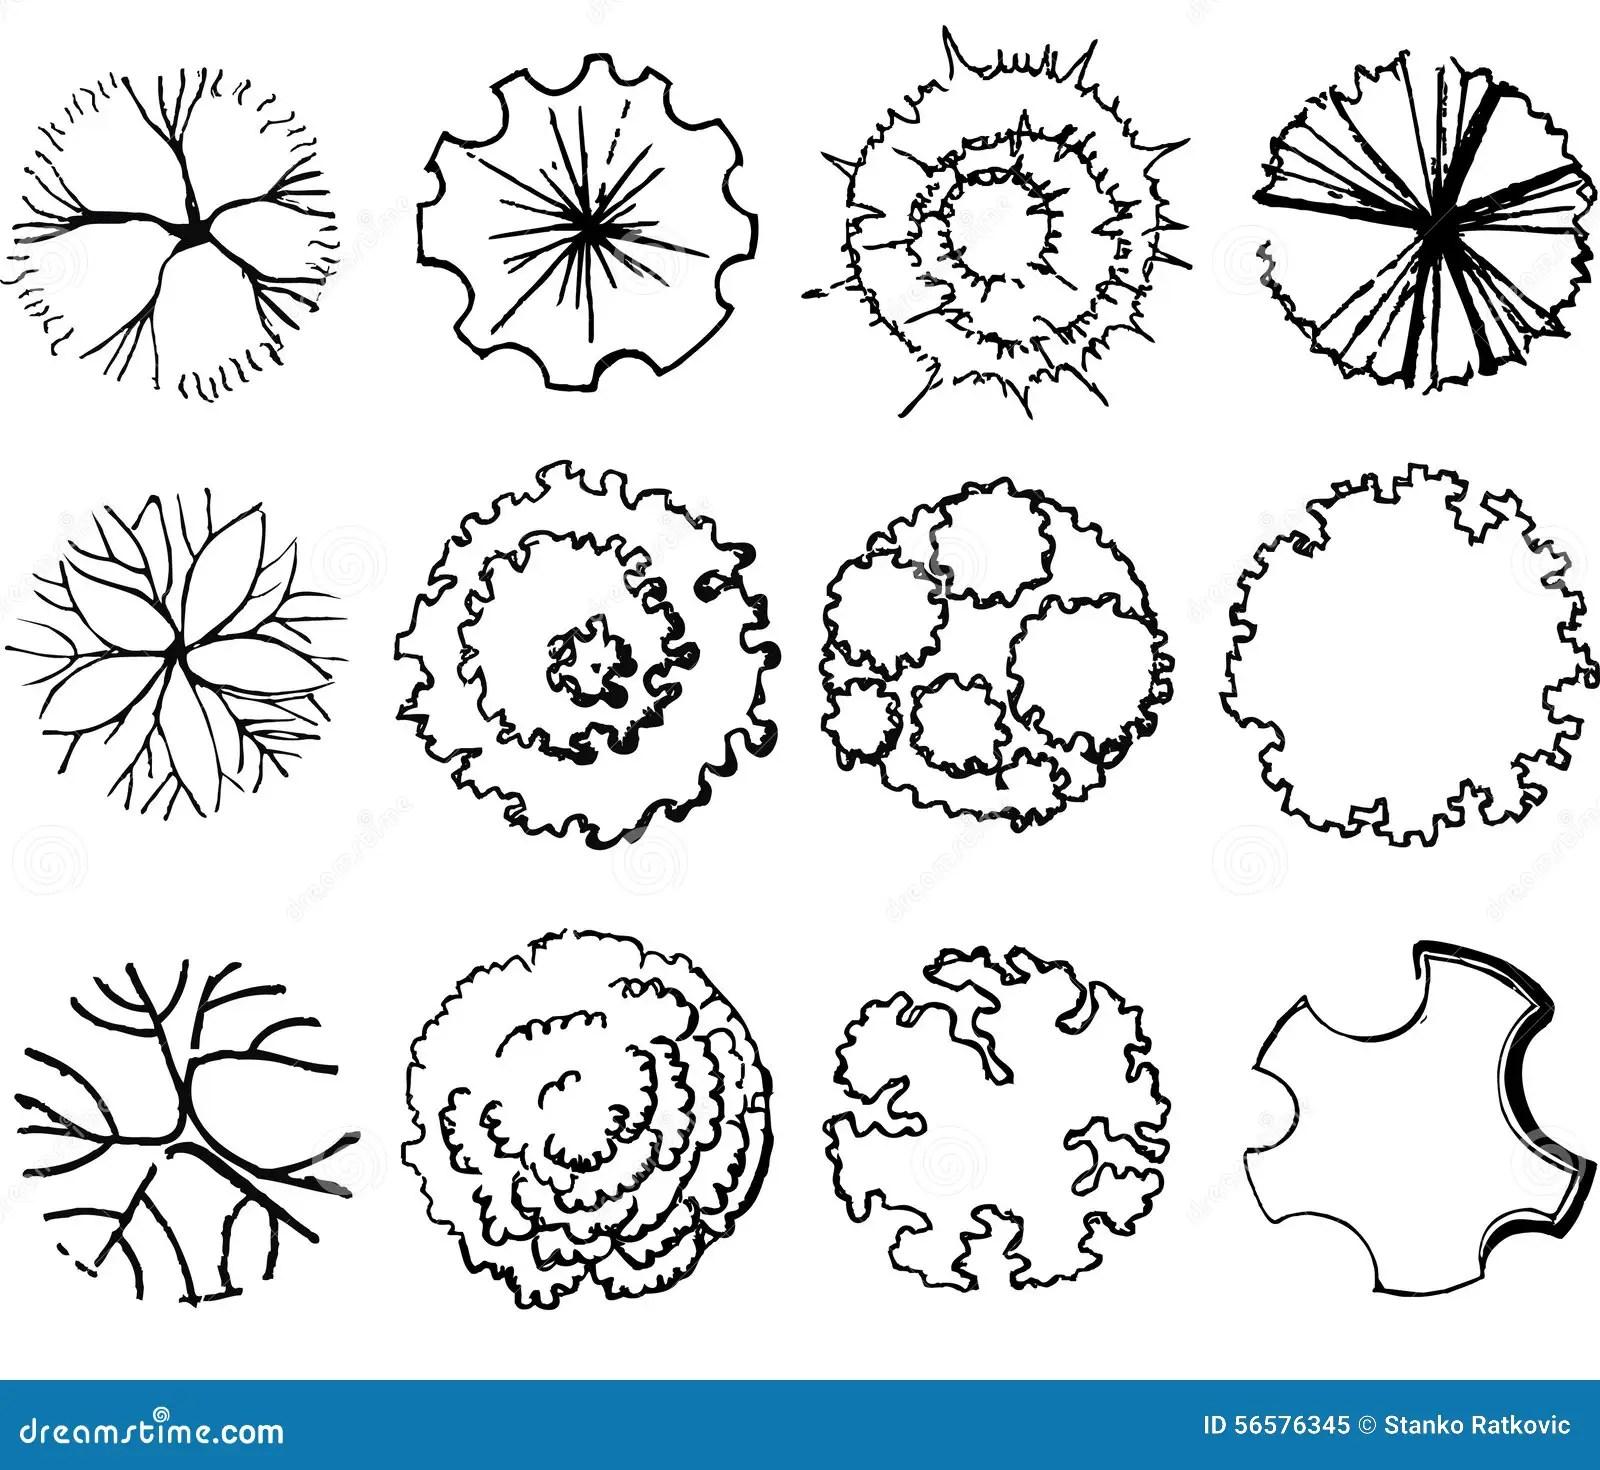 shrub graphic symbols diagram unilite wiring a set of treetop stock illustration image